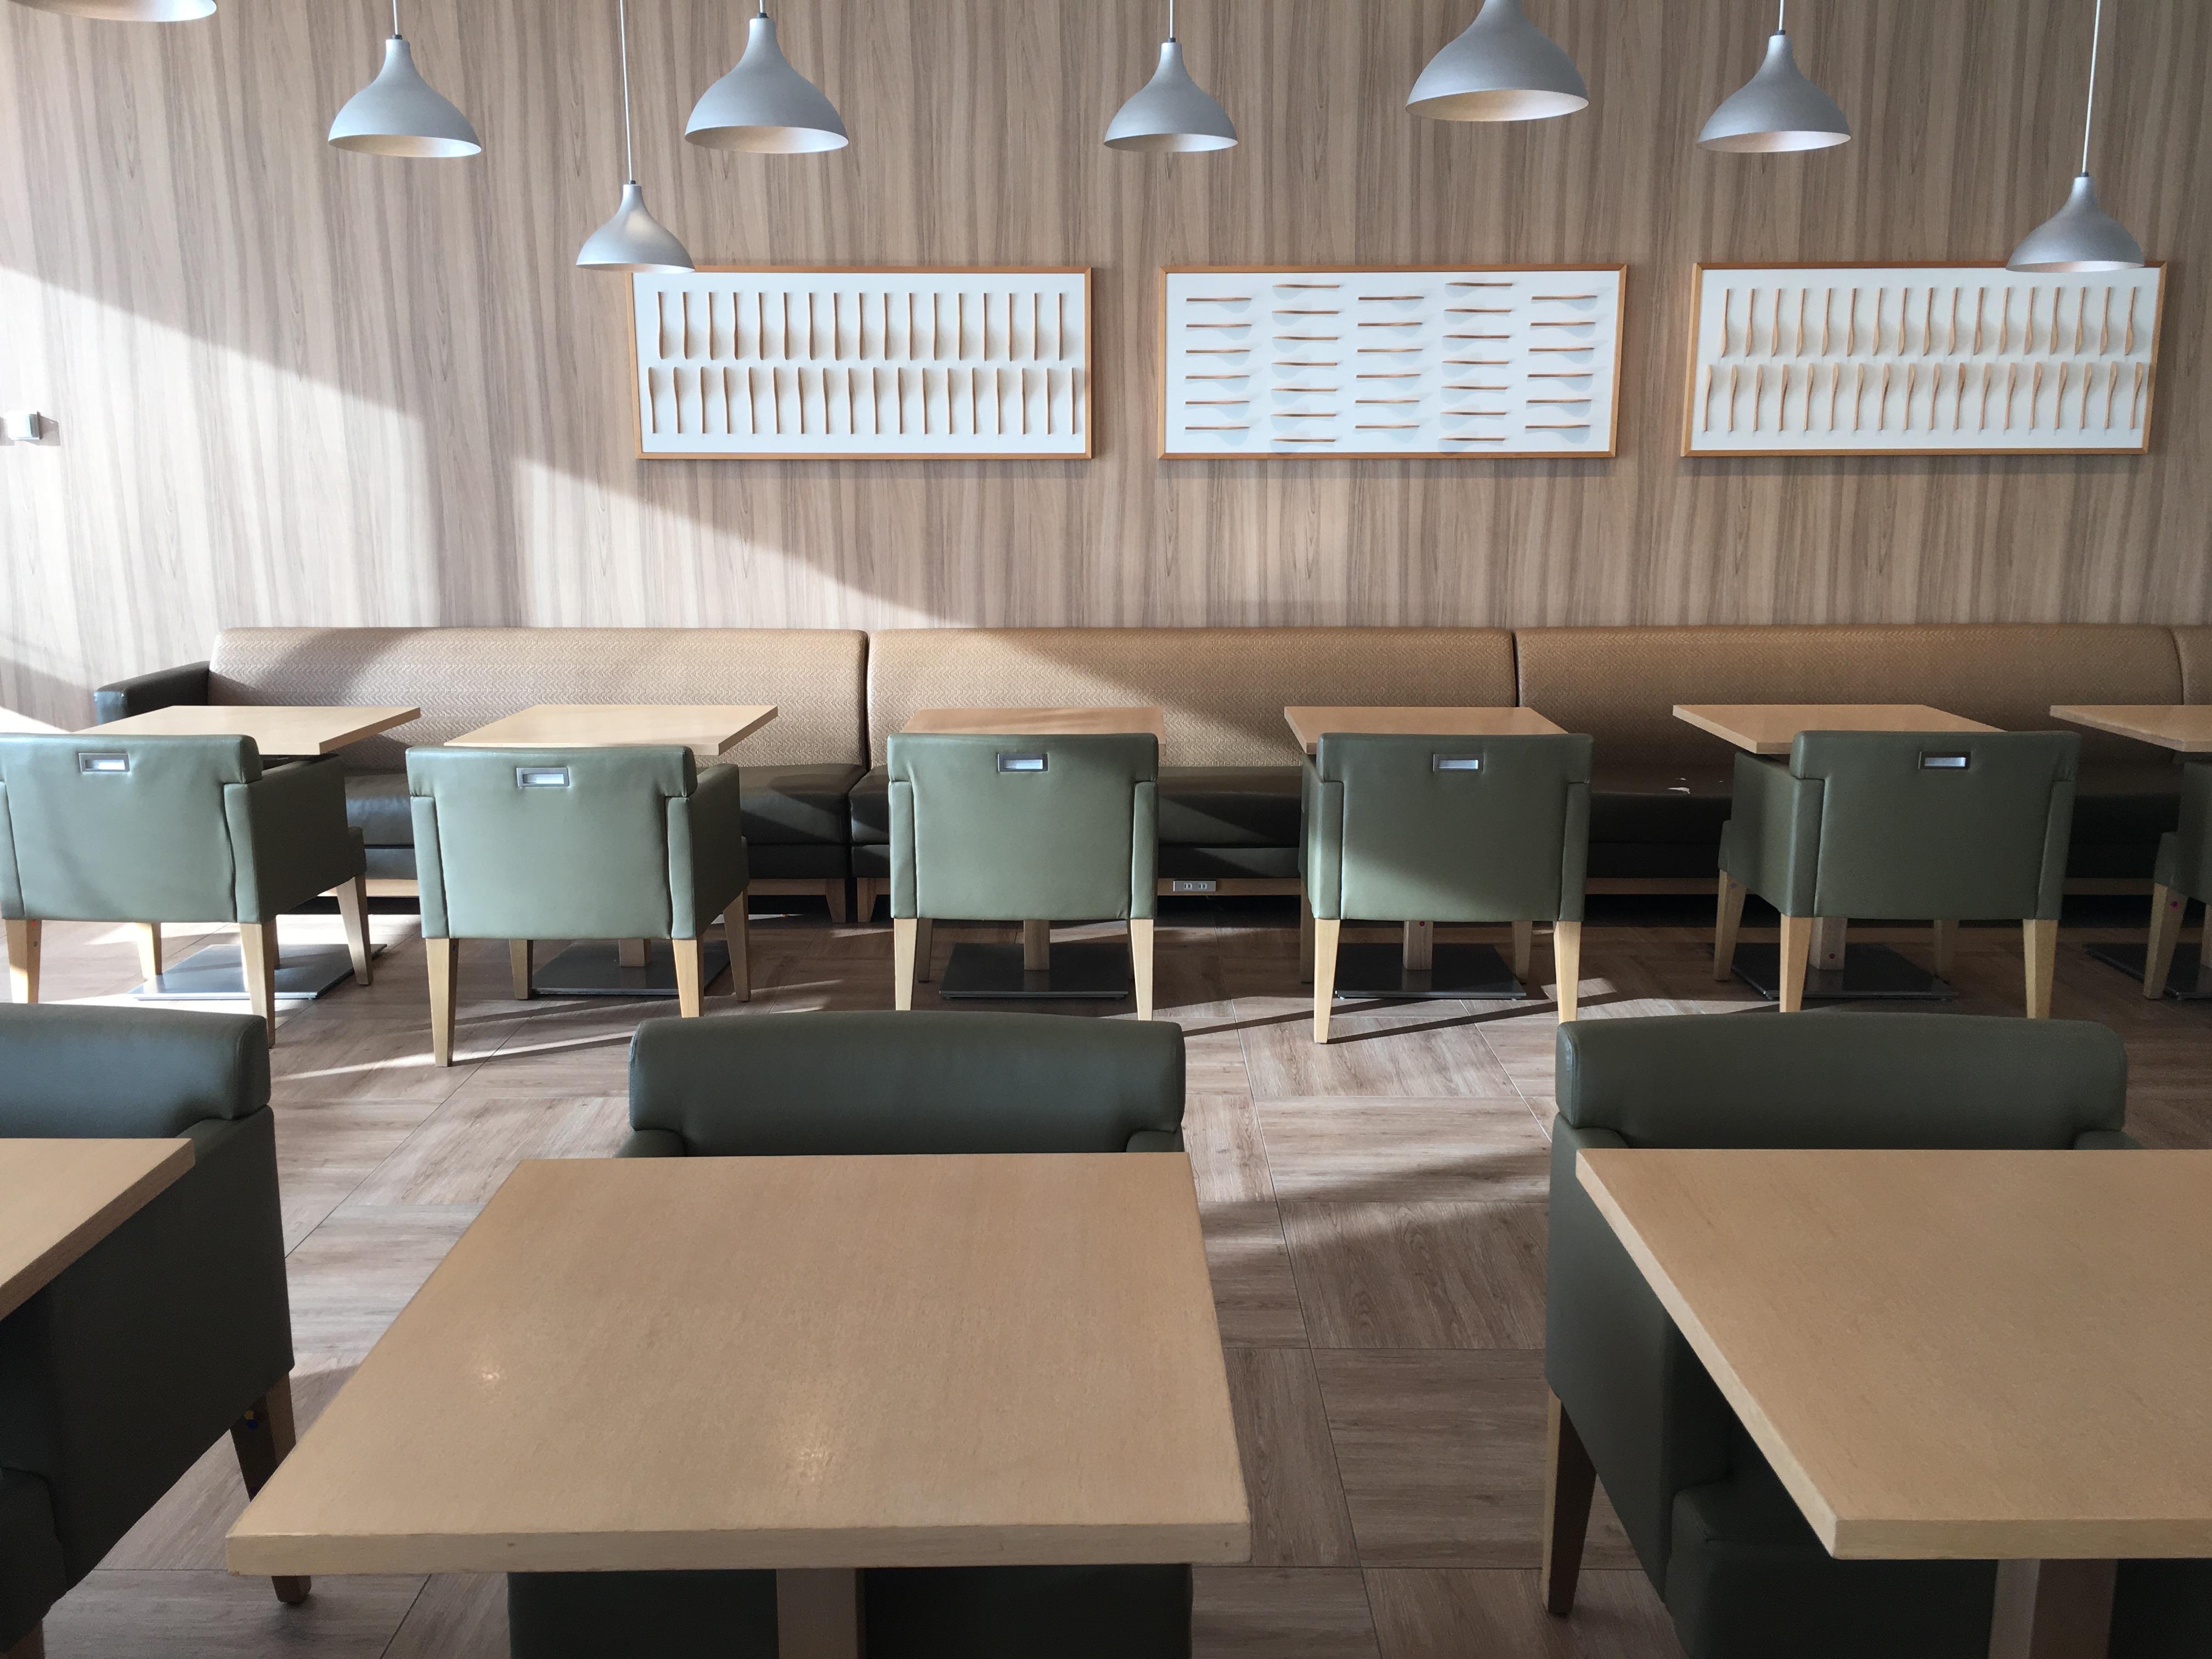 Lounge Review : 羽田空港(HND) JAL(JL) 国際線 サクララウンジ スカイビュー(Sakura Lounge Skyview)